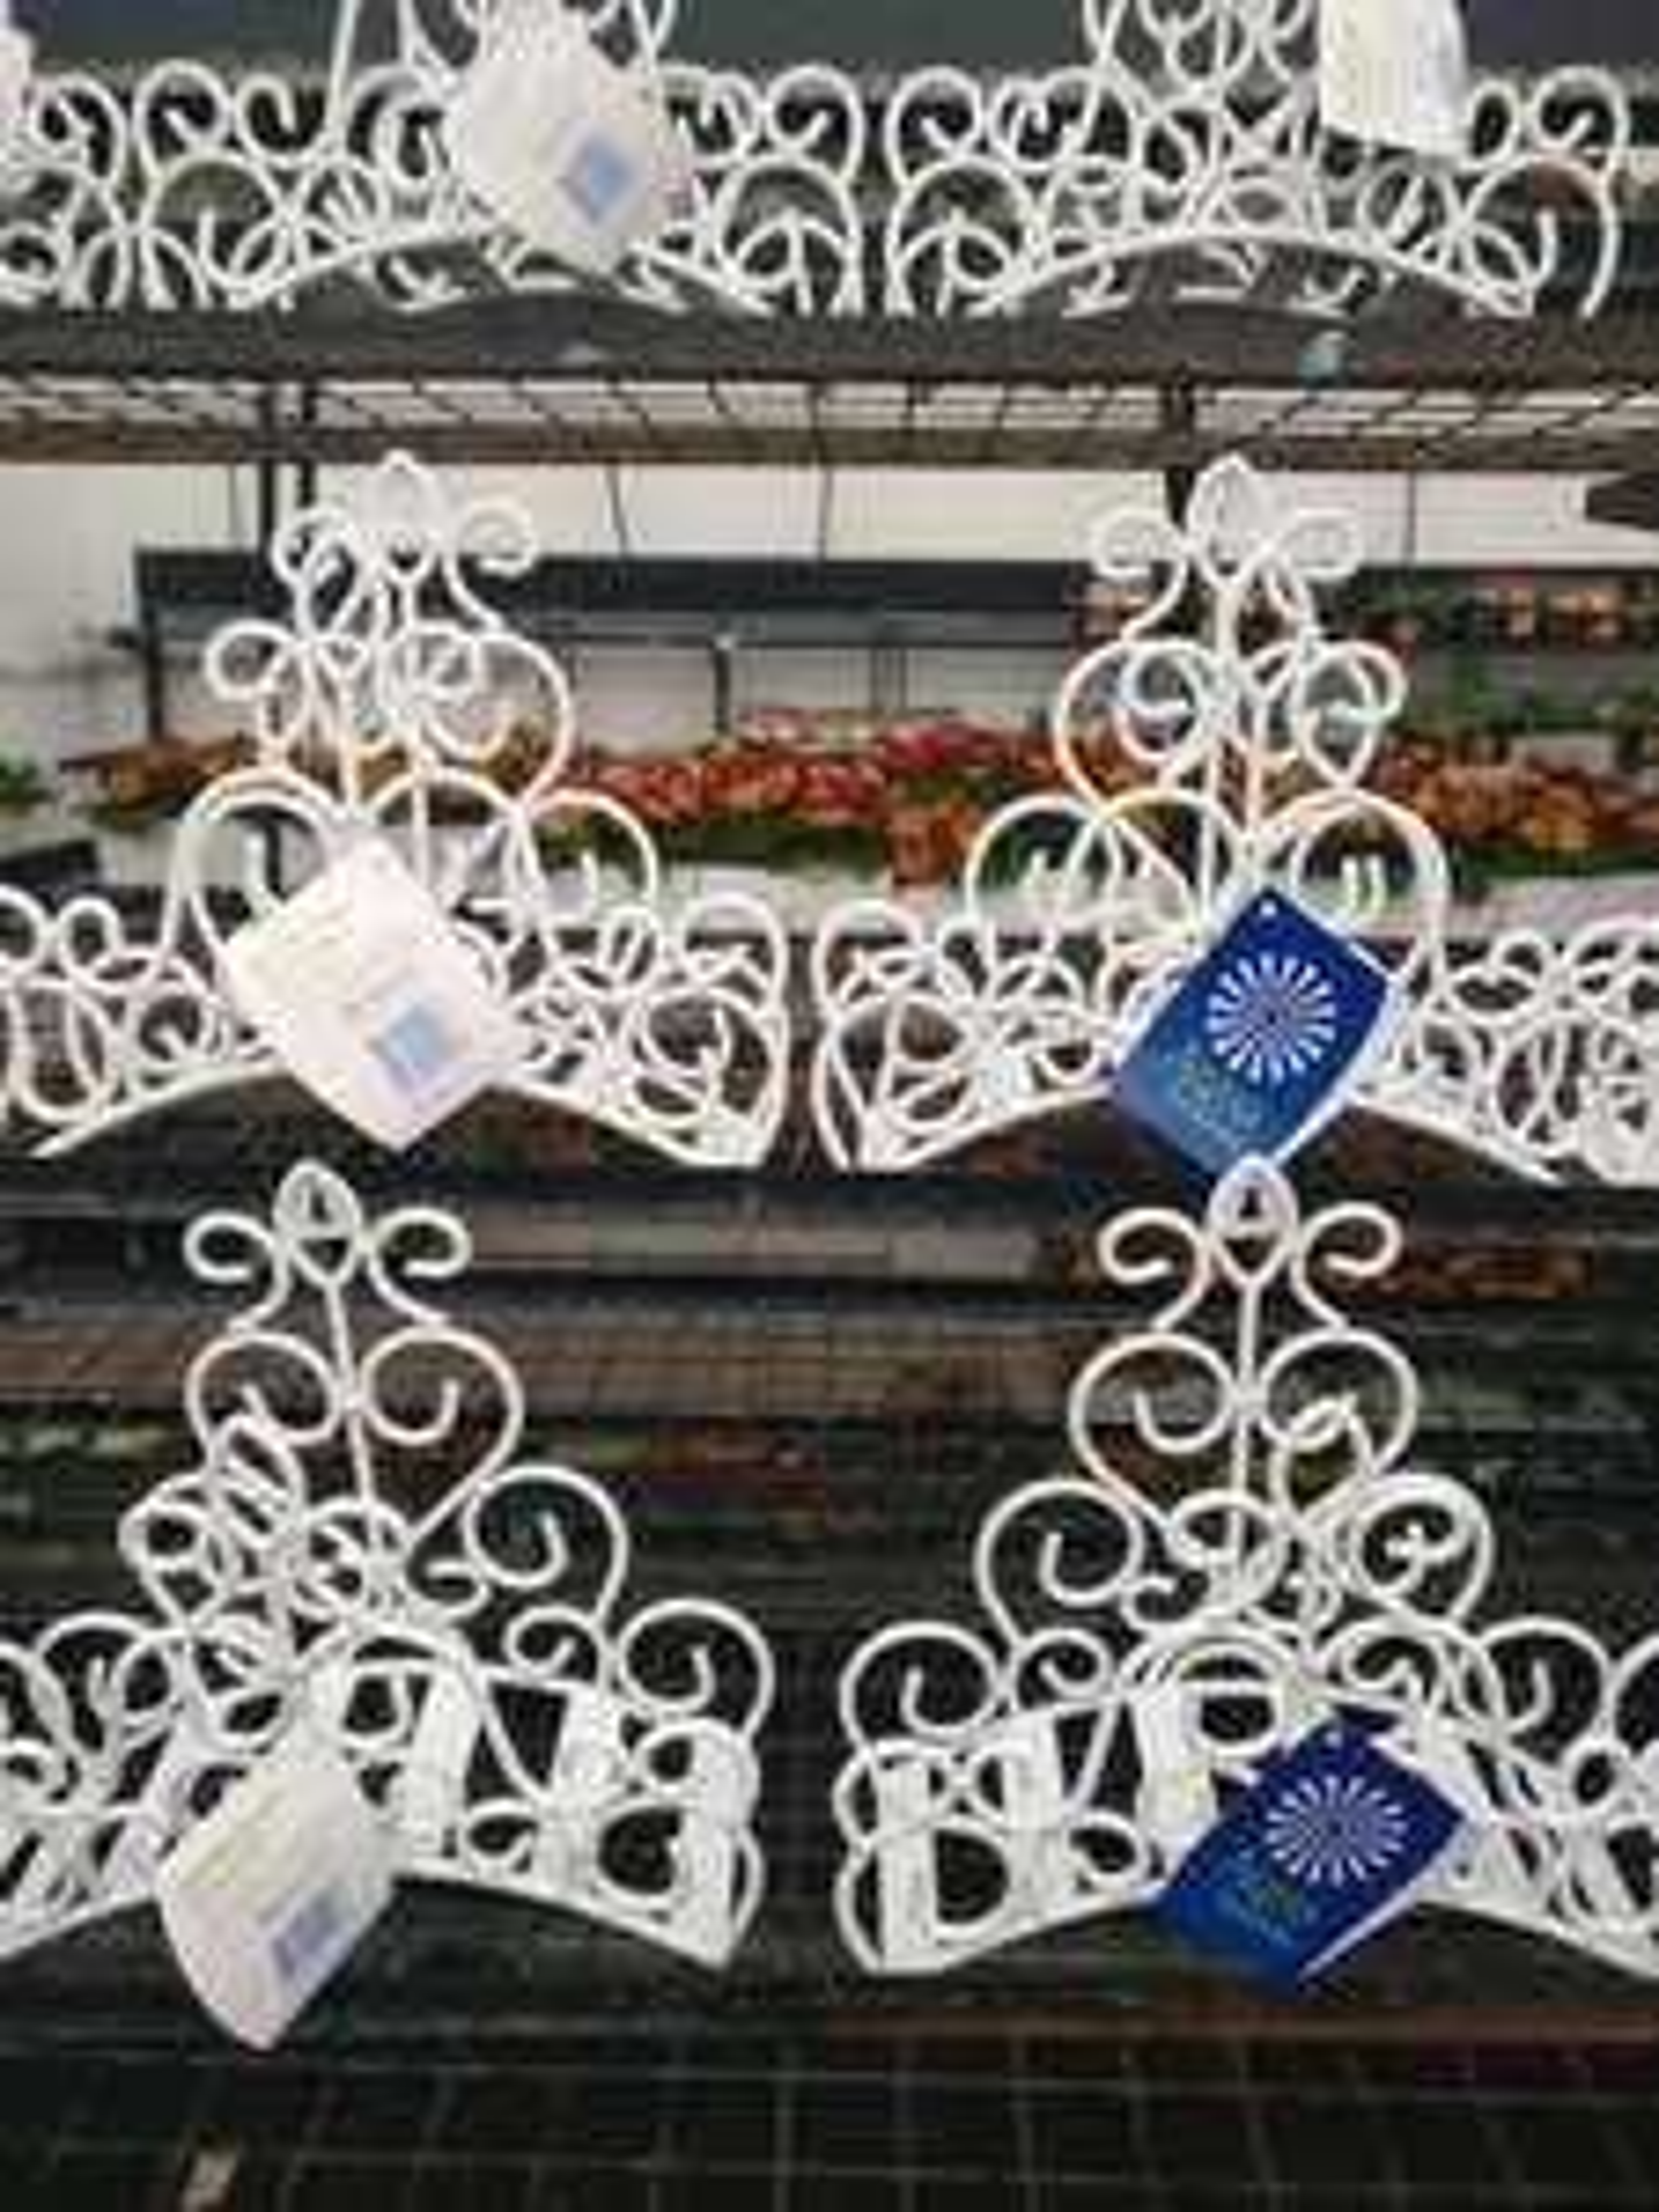 Decorative garden hose pipe hanger was £7.97 now £3.50 in Homebase